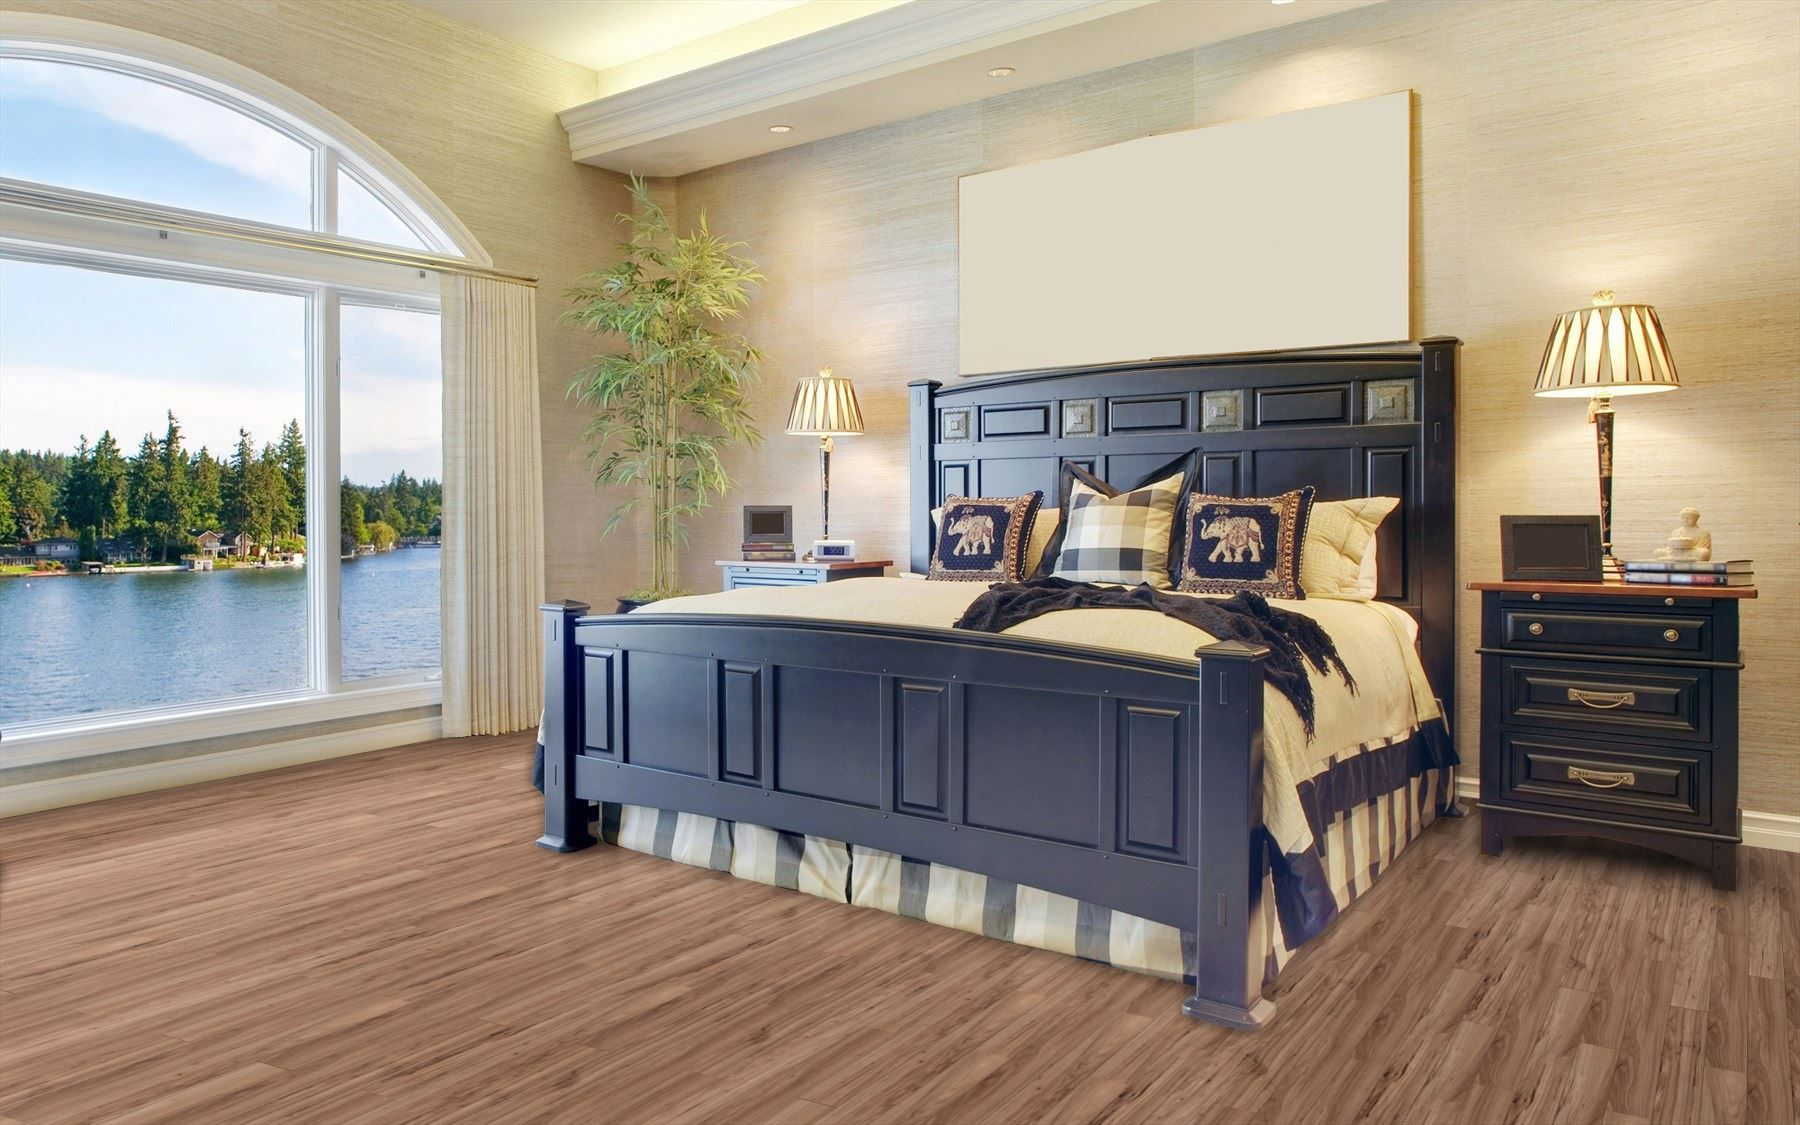 Grassy Creek Maple Laminate Flooring Luxury bedroom master